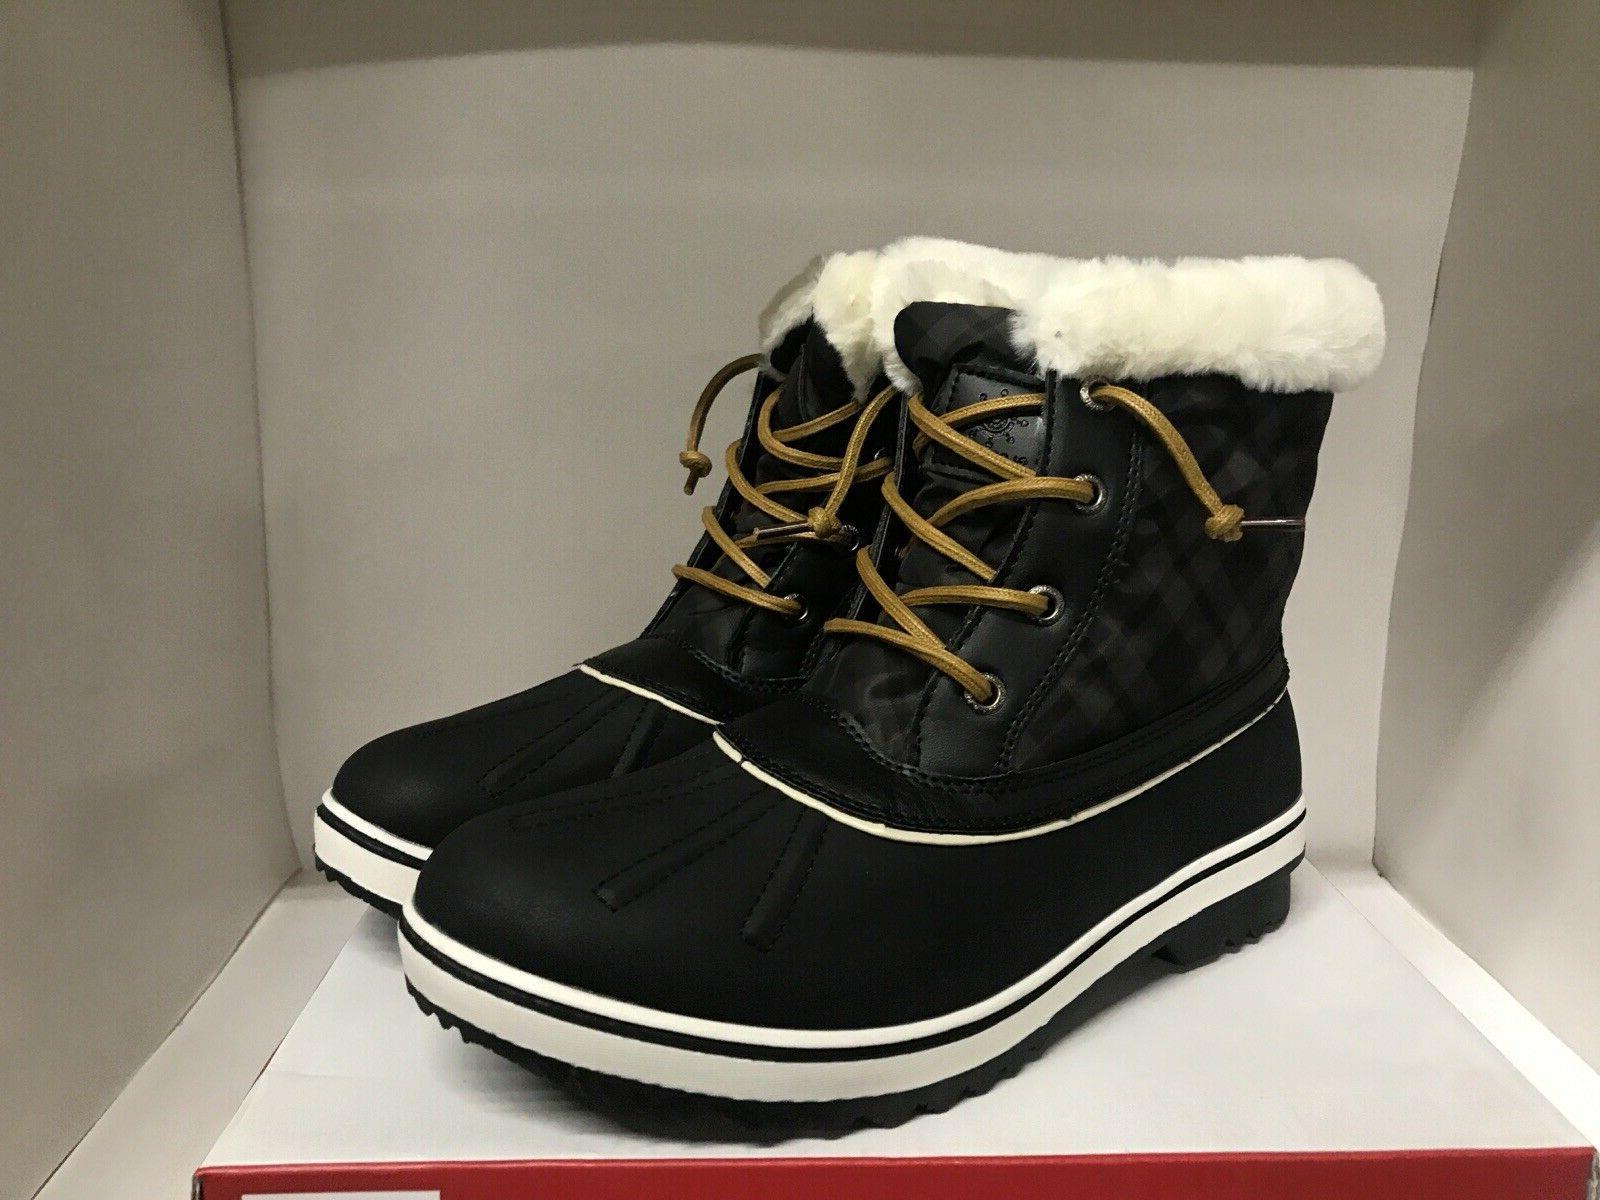 winter fur lined snow boots black women